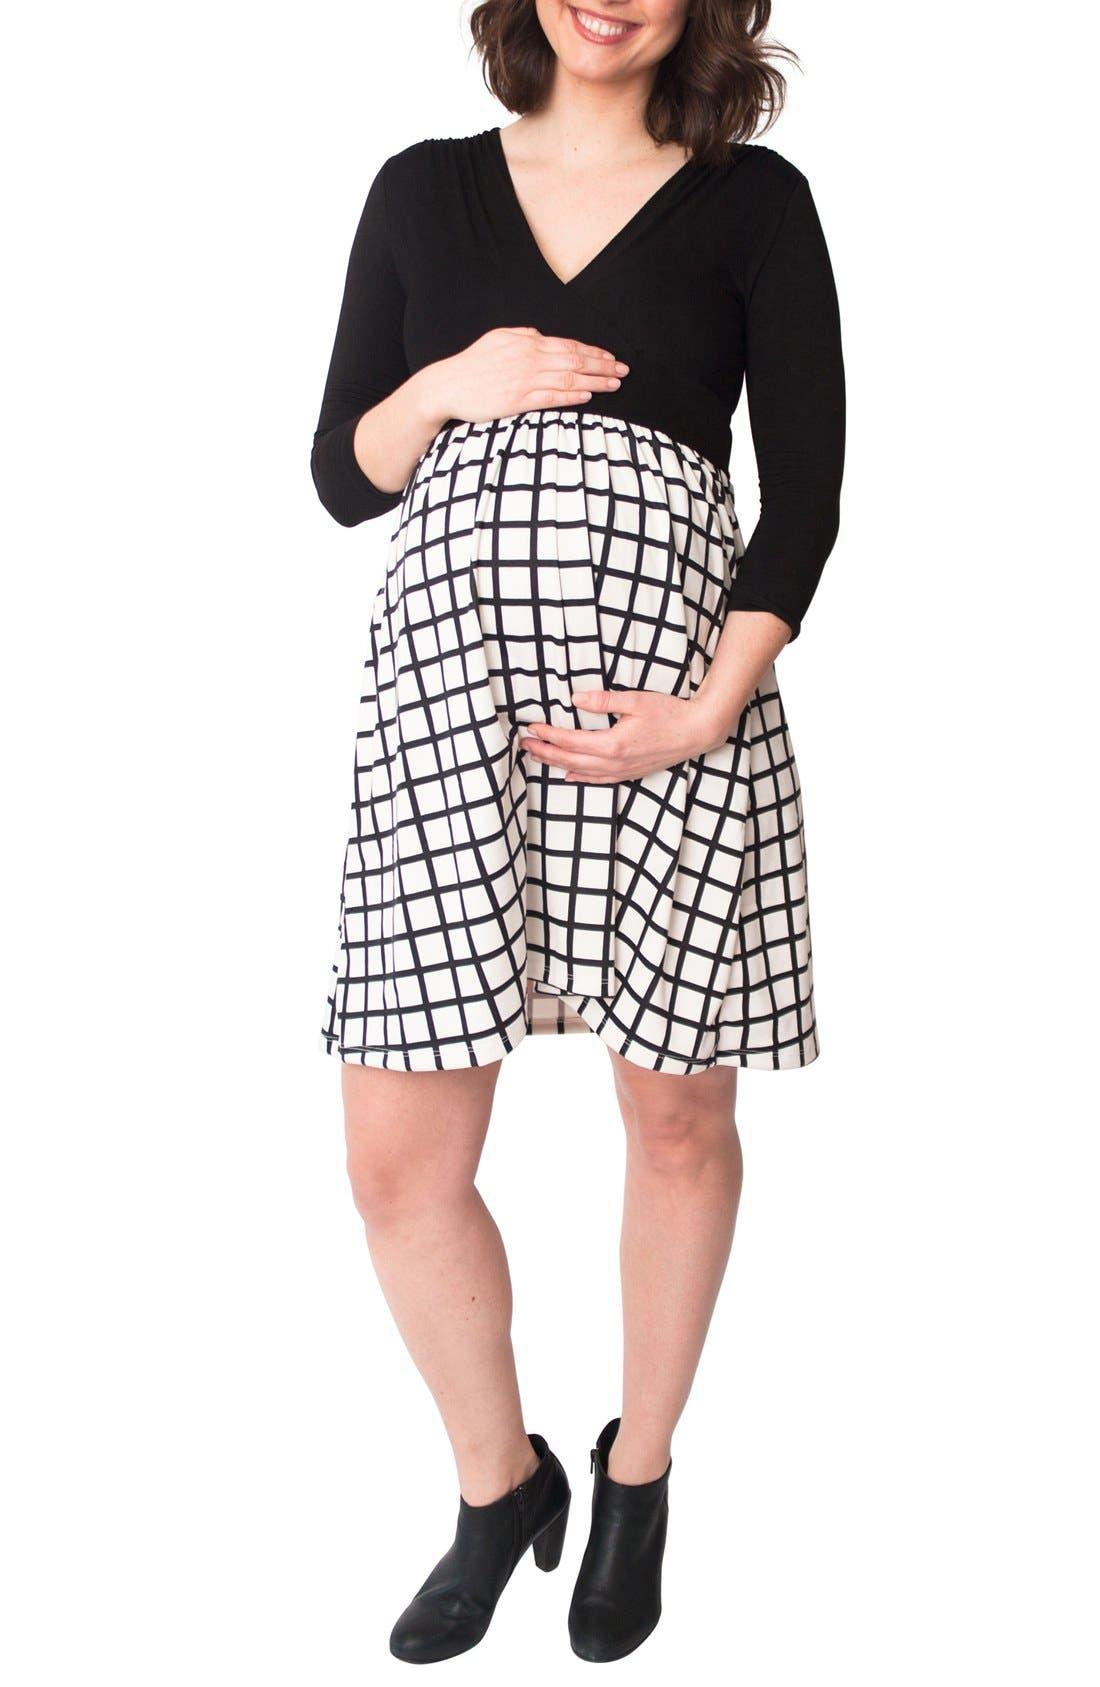 Alternate Image 1 Selected - Nom 'Nora' Surplice Maternity/Nursing Dress